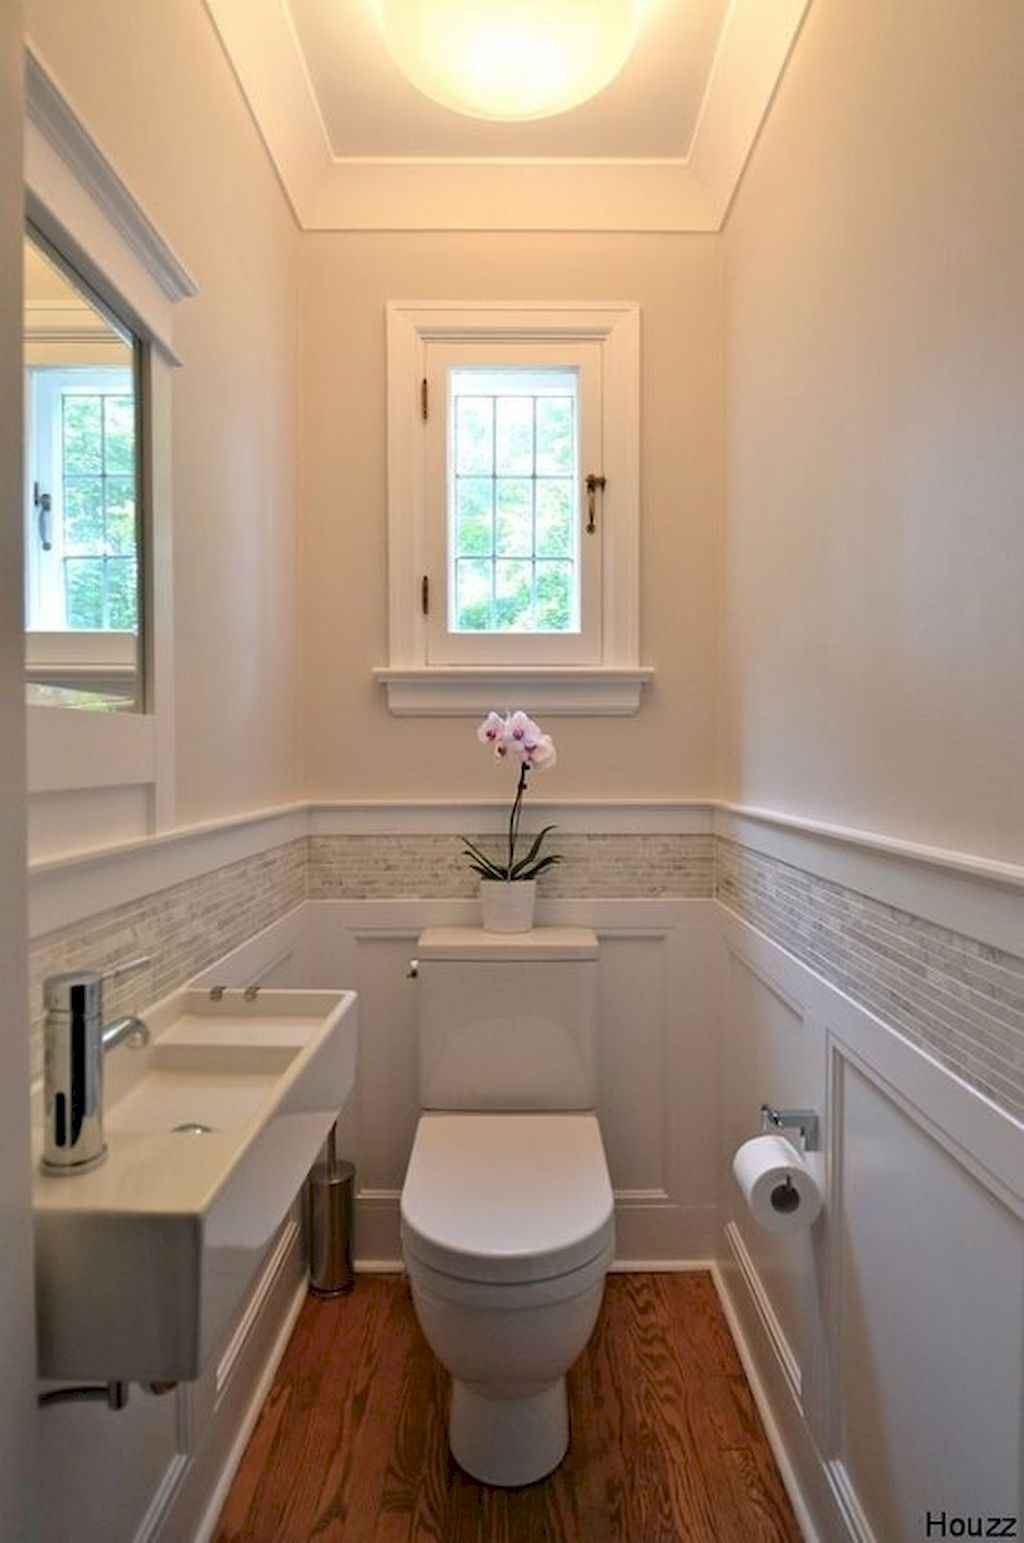 111 Brilliant Small Bathroom Remodel Ideas On A Budget (16)